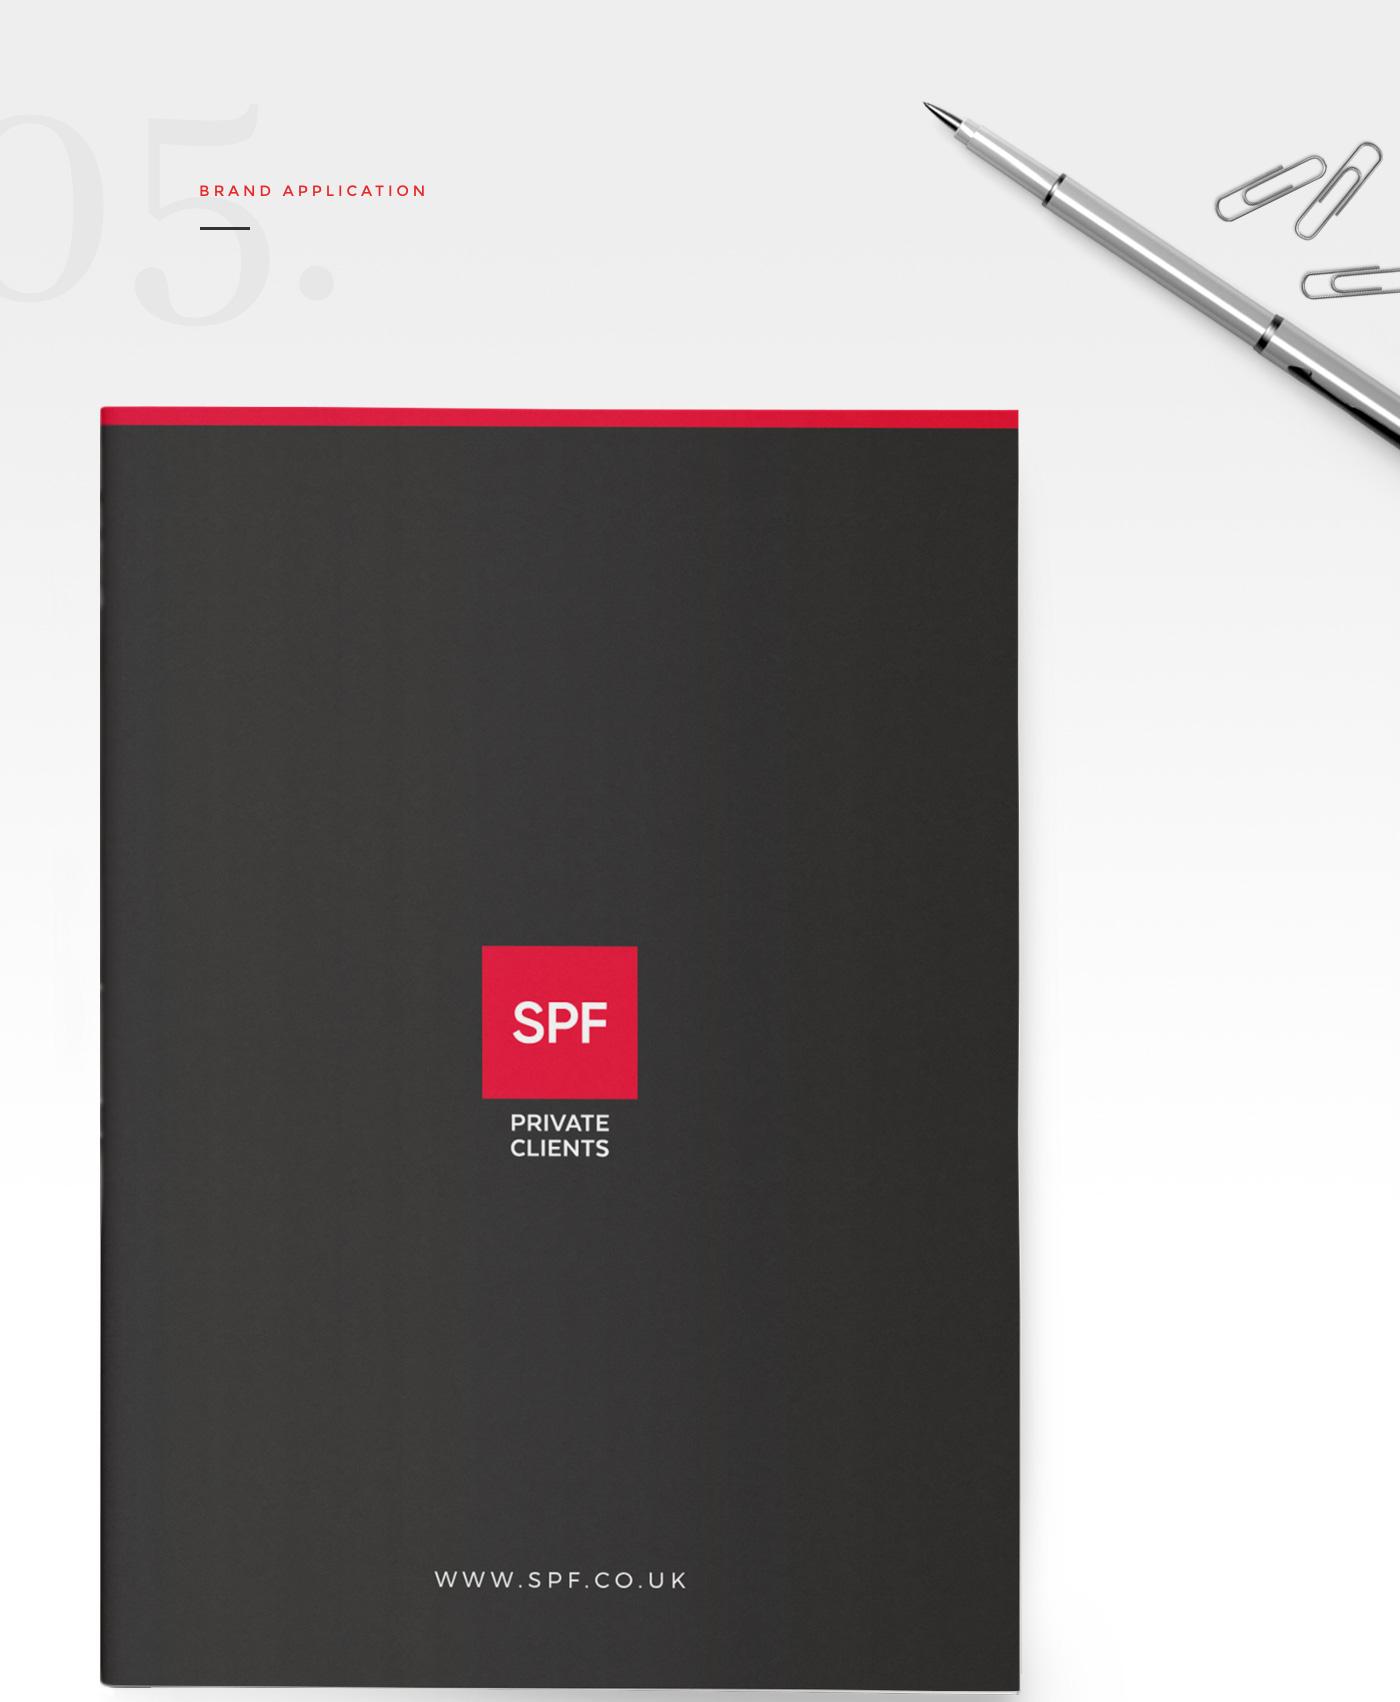 property wealth management insurance branding  UI ux Corporate Identity finance logo Website Design